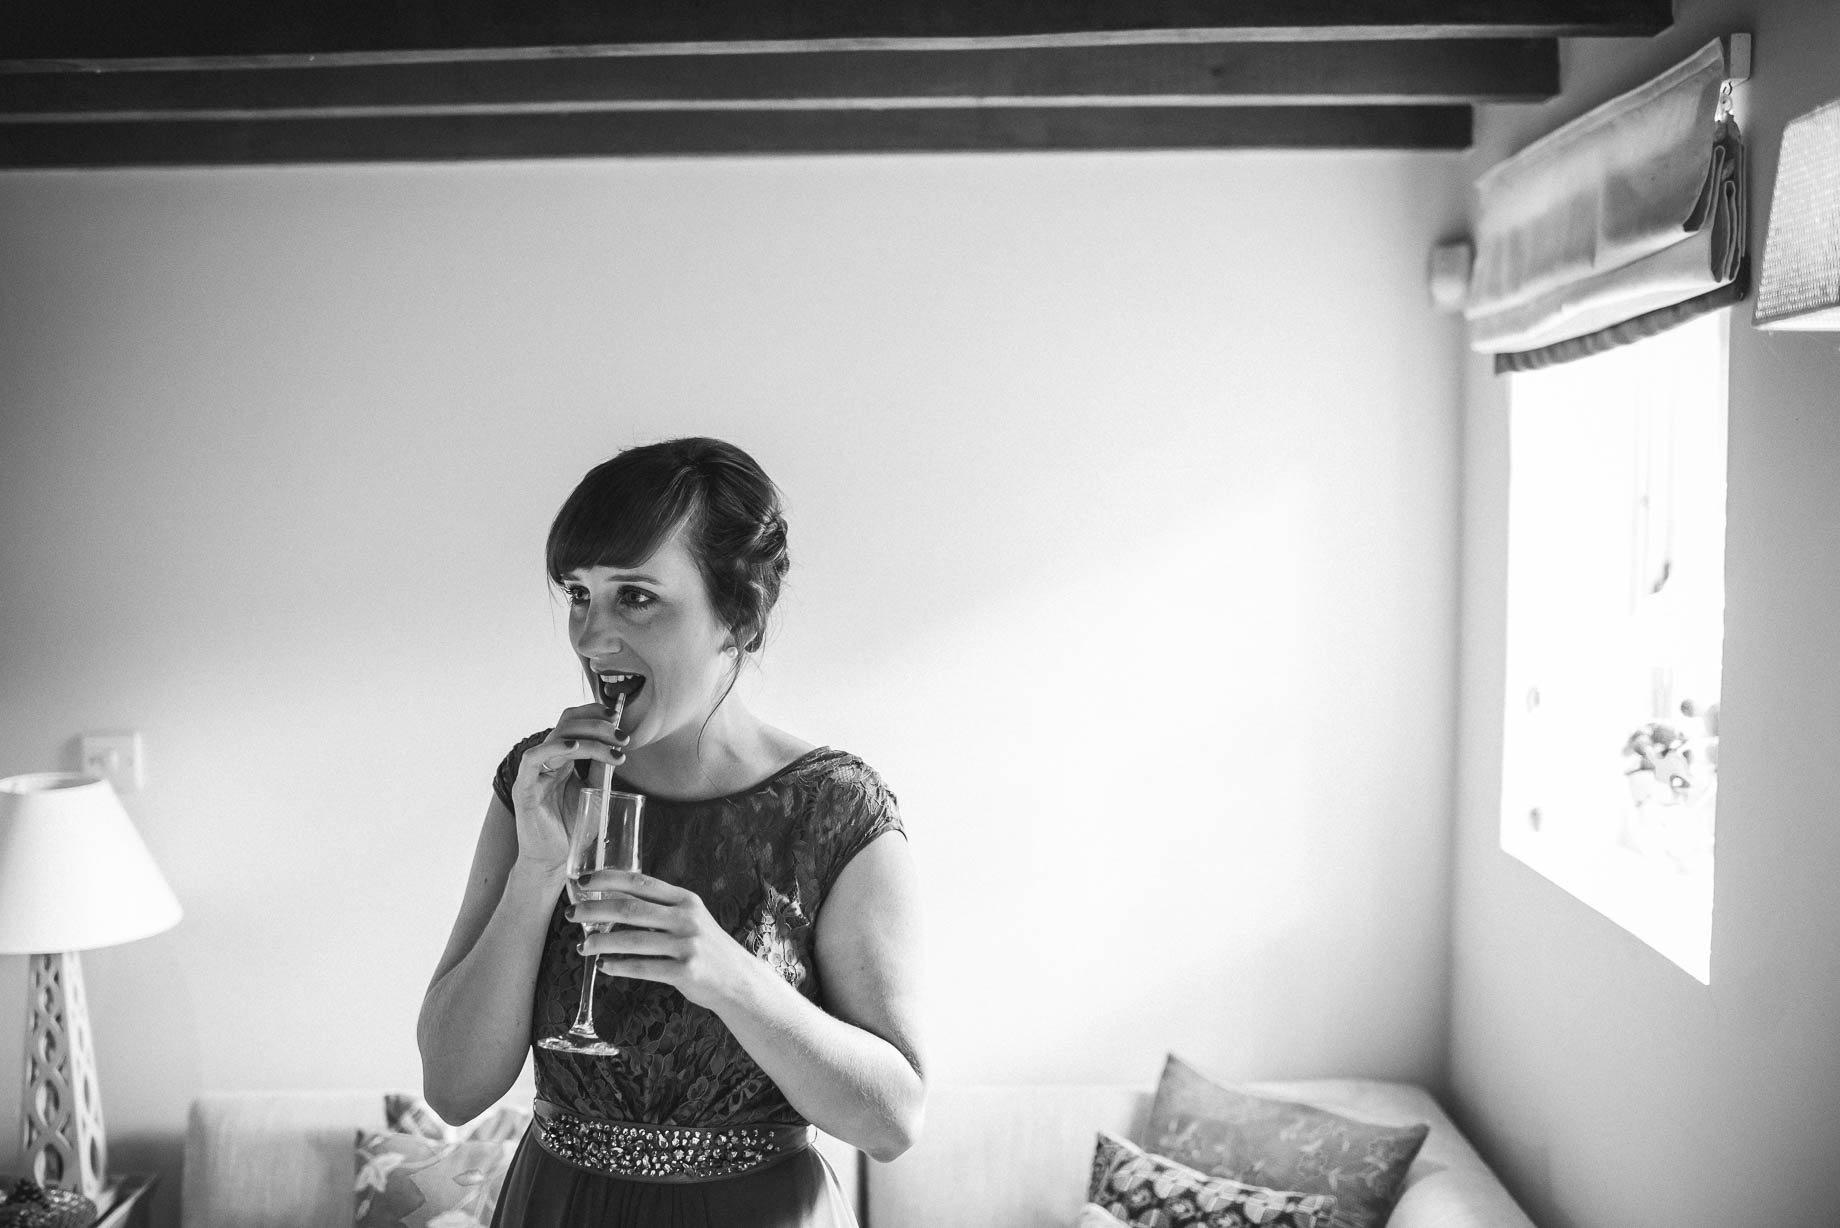 Gaynes Park wedding photography - Guy Collier Photography - Rachel and Jon (41 of 169)